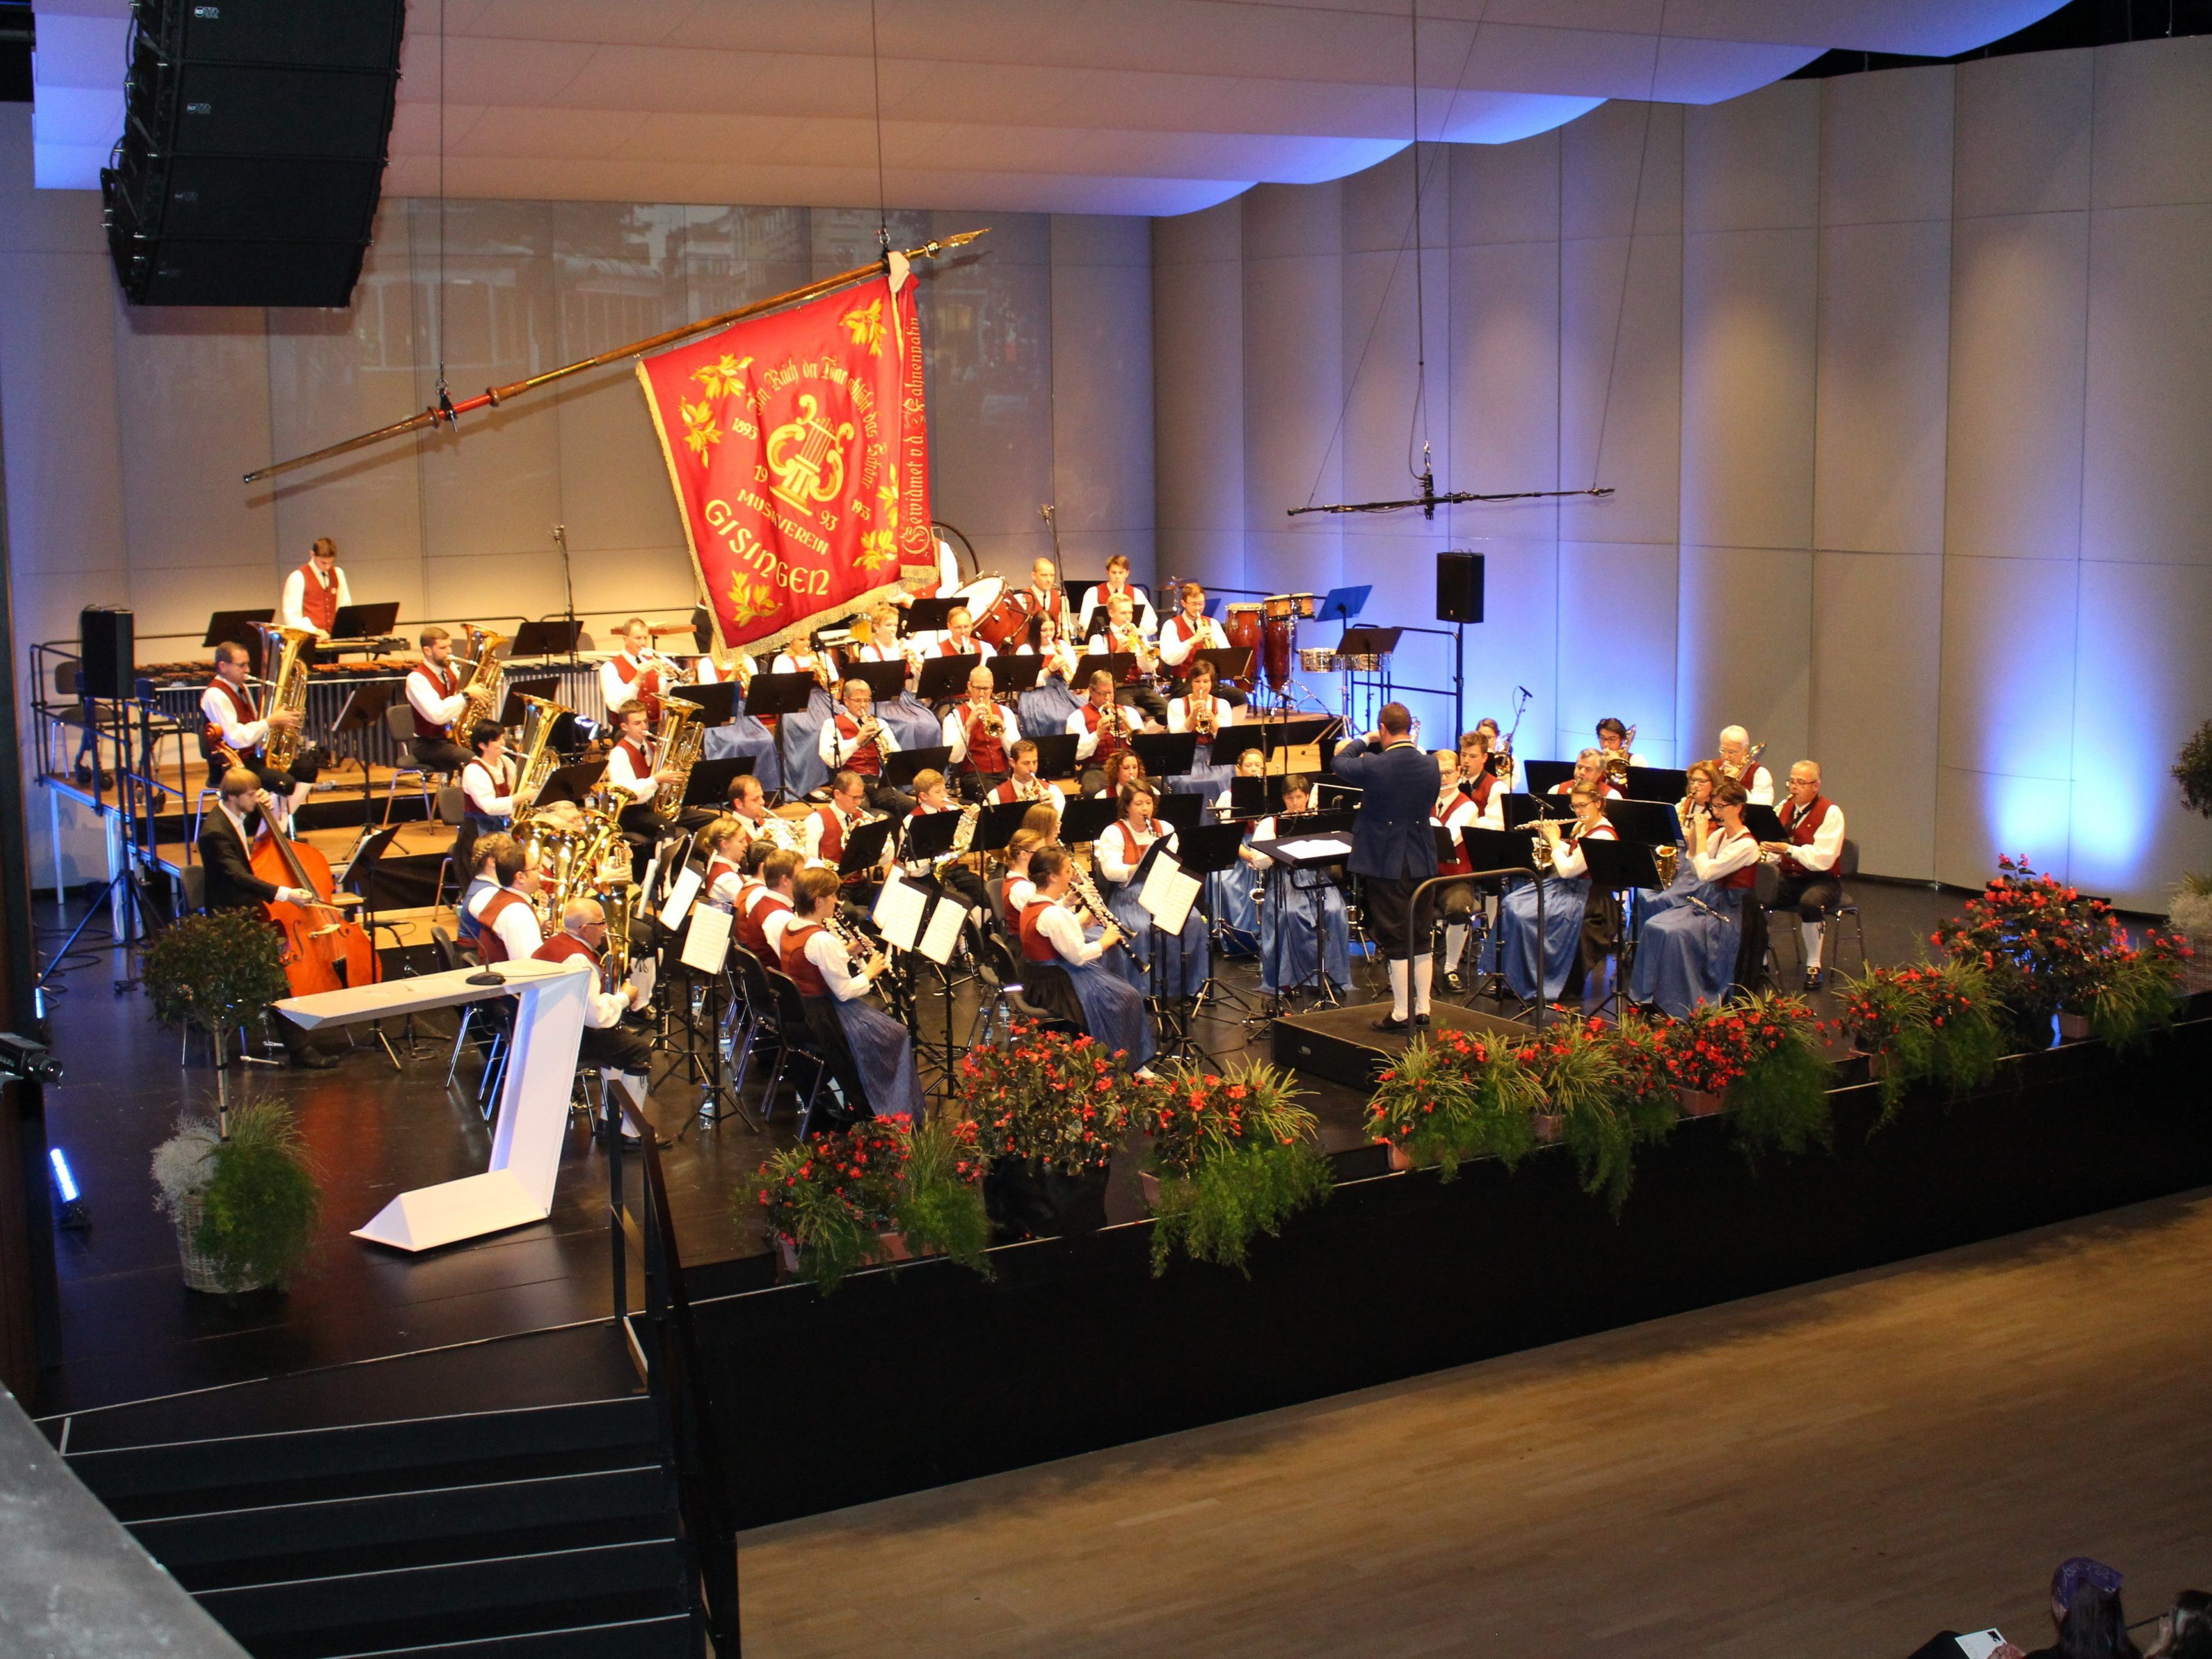 Temperamentvolles Konzert des Musikverein Gisingen zum 125-jährigen Bestandsjubiläum